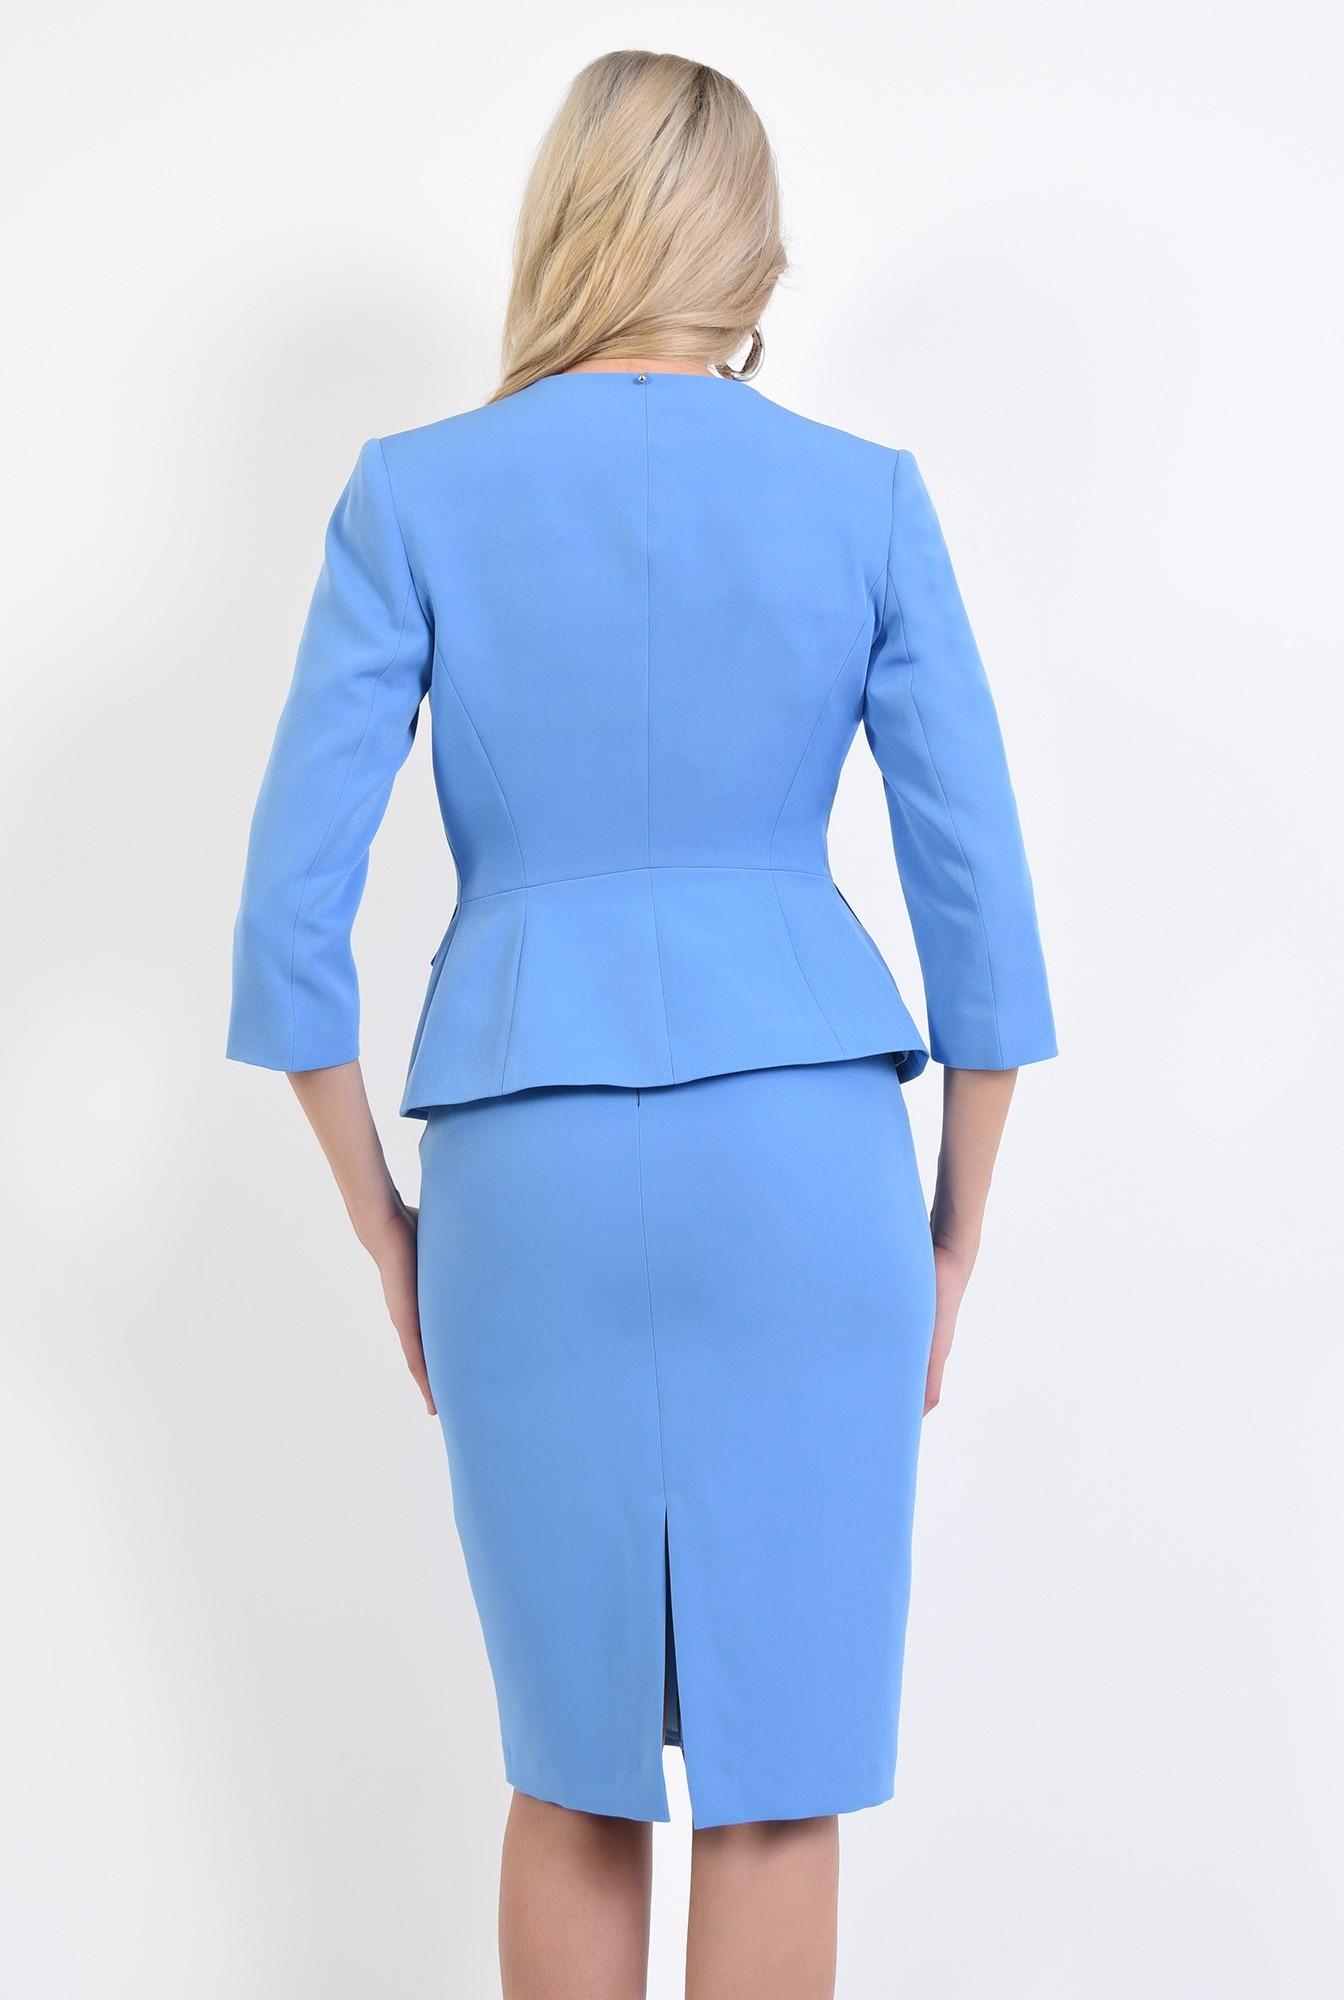 1 - 360 - sacou bleu, office, costum, buzunare cu clapa, anchior petrecut